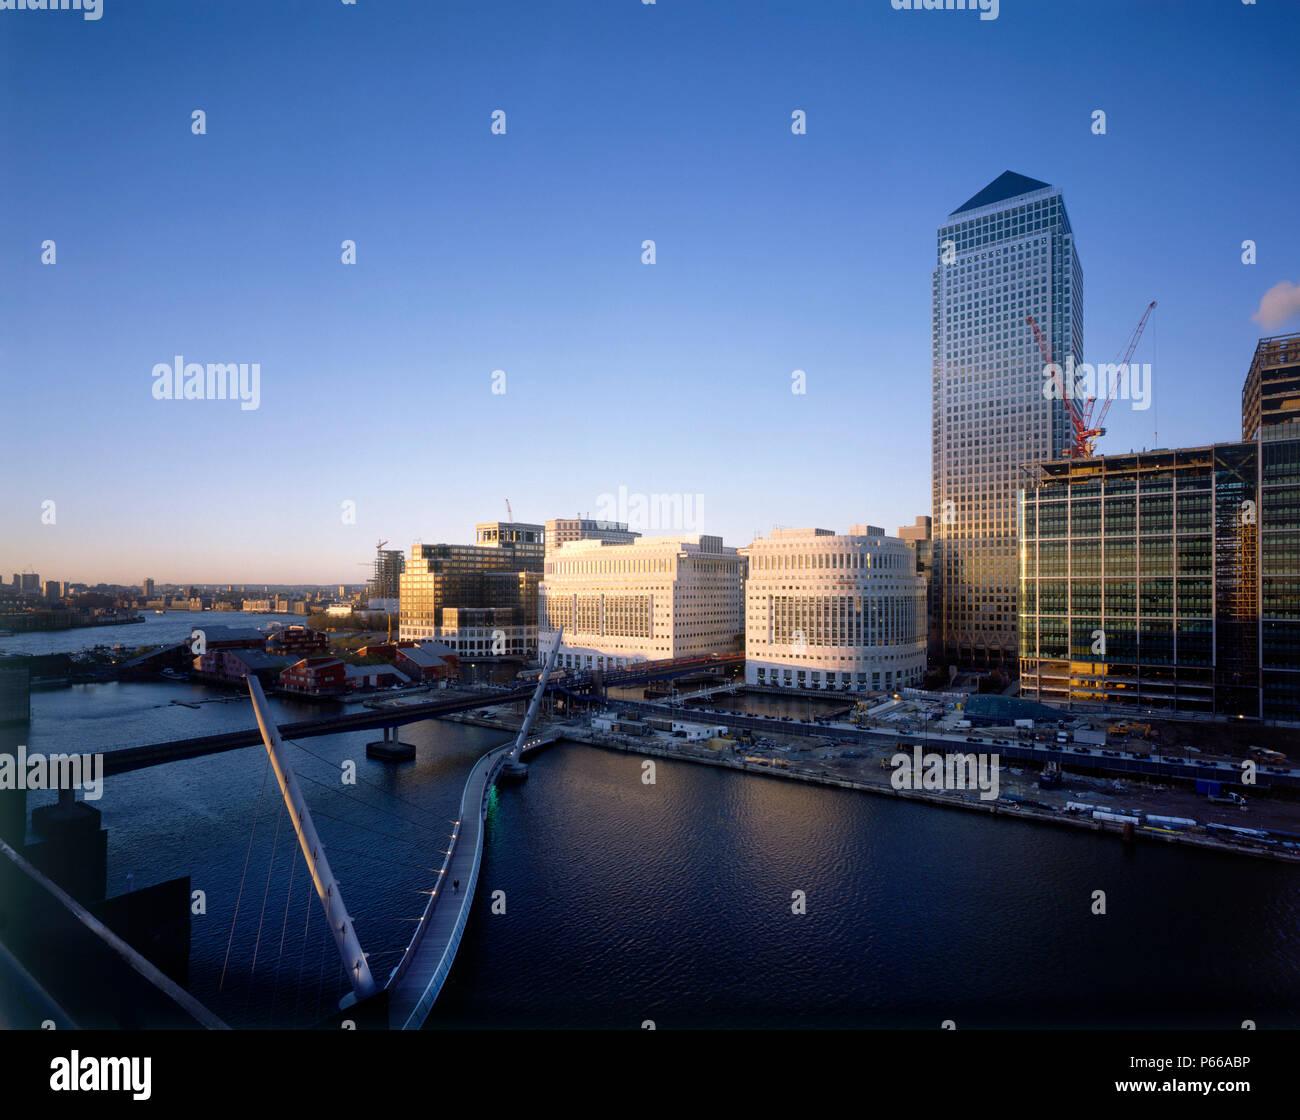 Canary Wharf  Docklands area. London  United Kingdom. - Stock Image